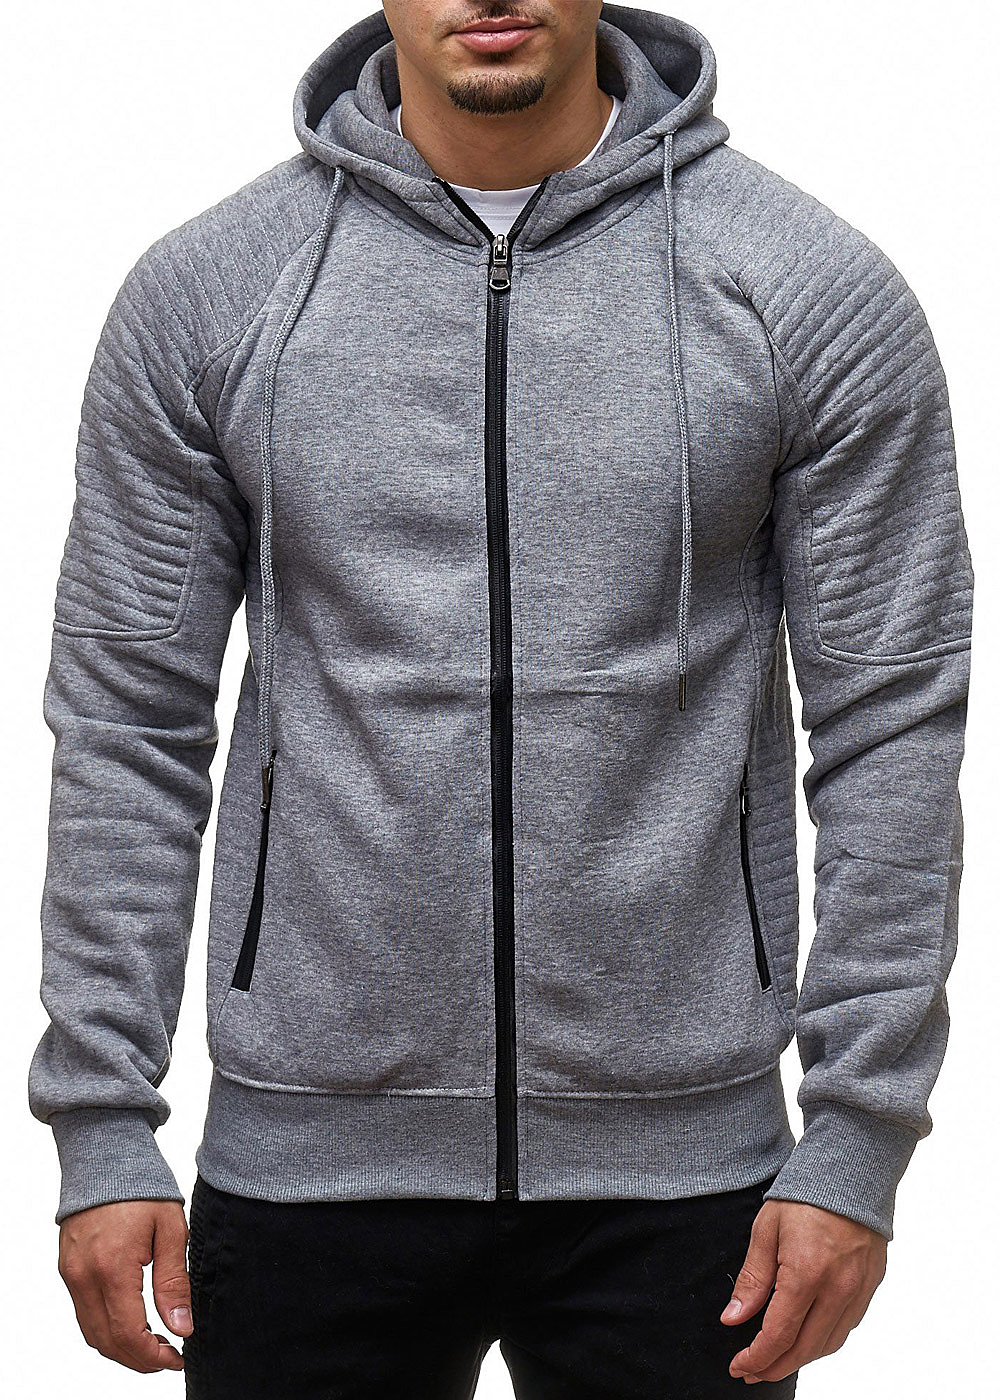 seventyseven lifestyle herren zip hoodie kapuze 2 taschen dunkel grau 77onlineshop. Black Bedroom Furniture Sets. Home Design Ideas